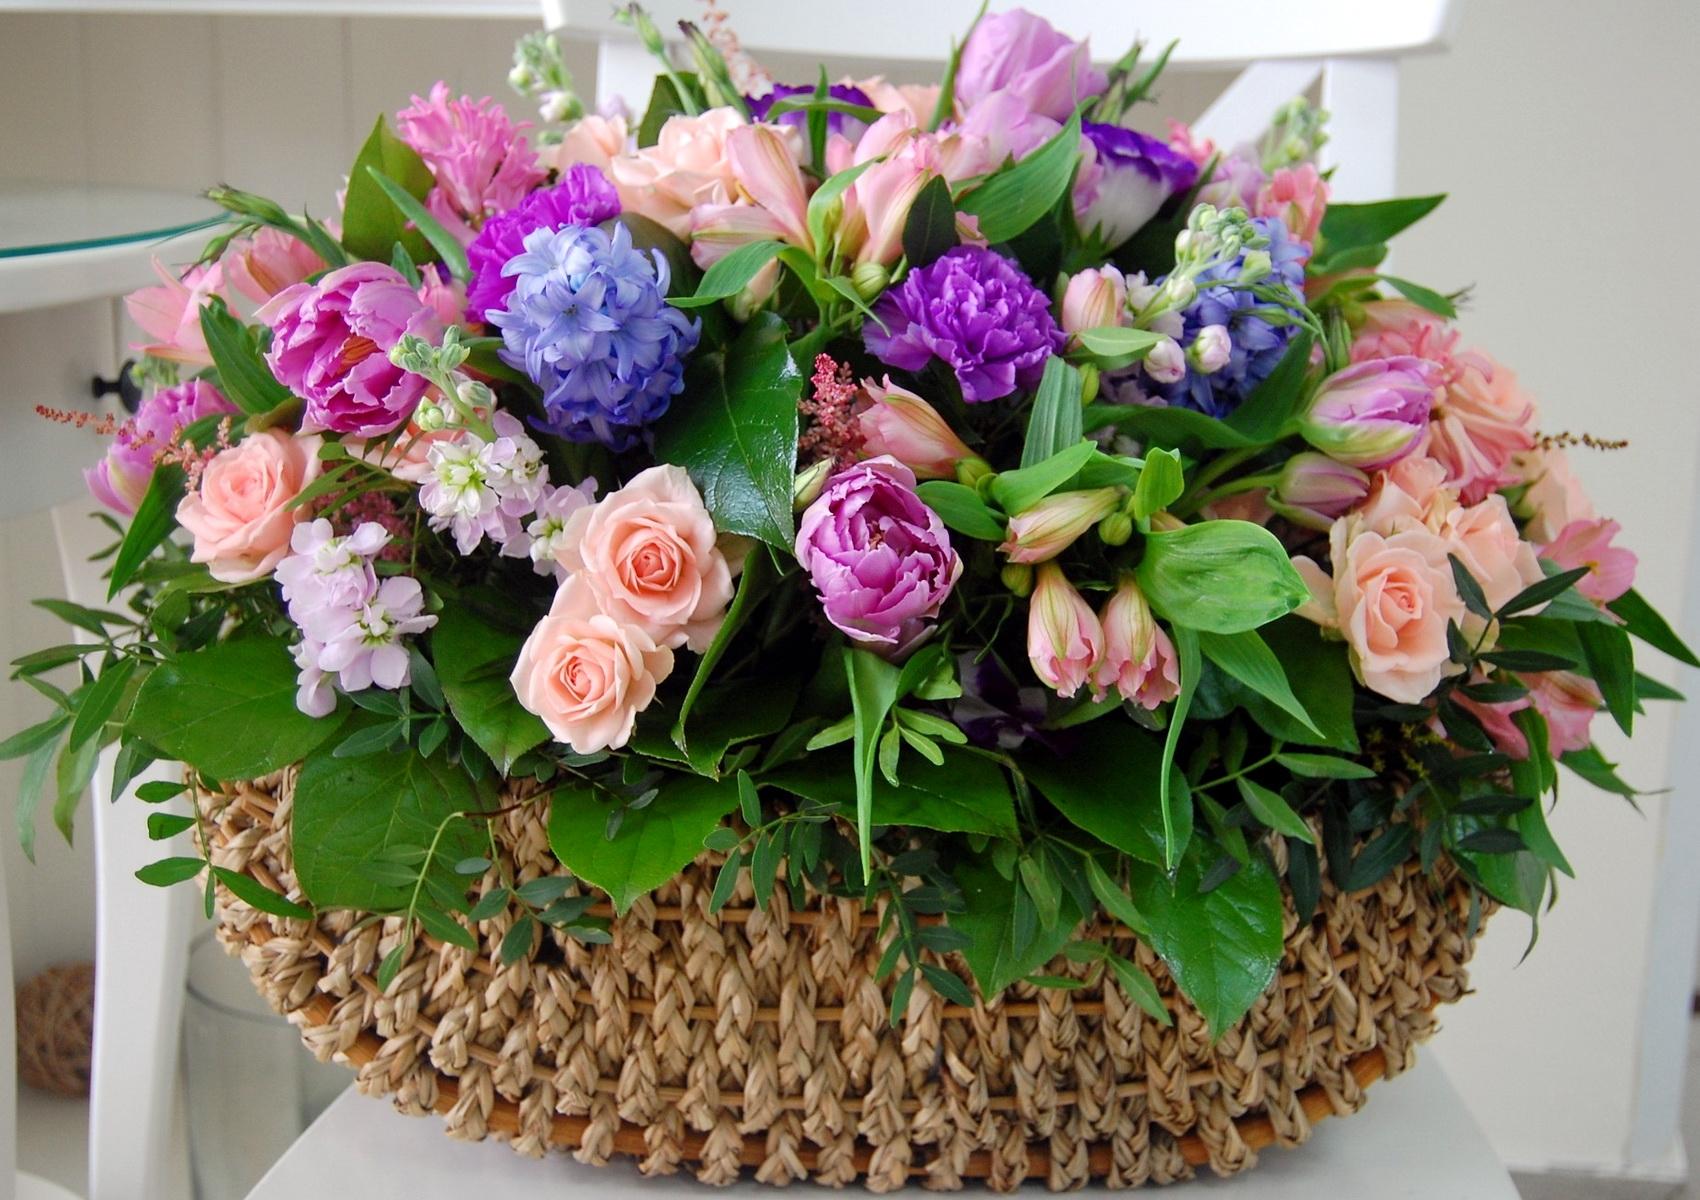 https://get.wallhere.com/photo/roses-hyacinths-flowers-song-beauty-decoration-1091329.jpg